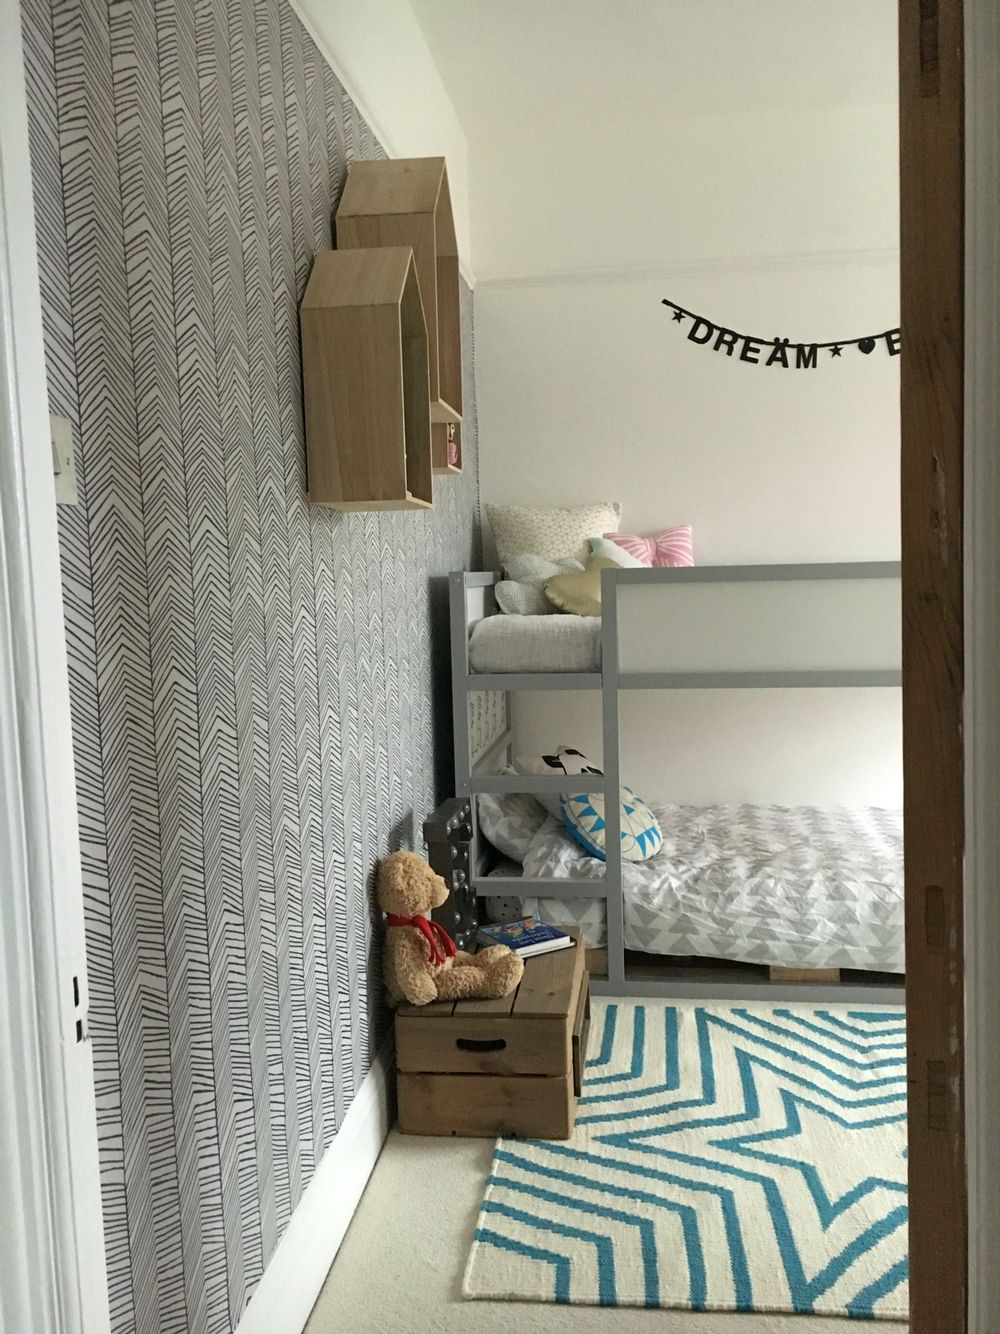 Kids room ikea kura bed hack home decor pinterest for Kura bed decoration